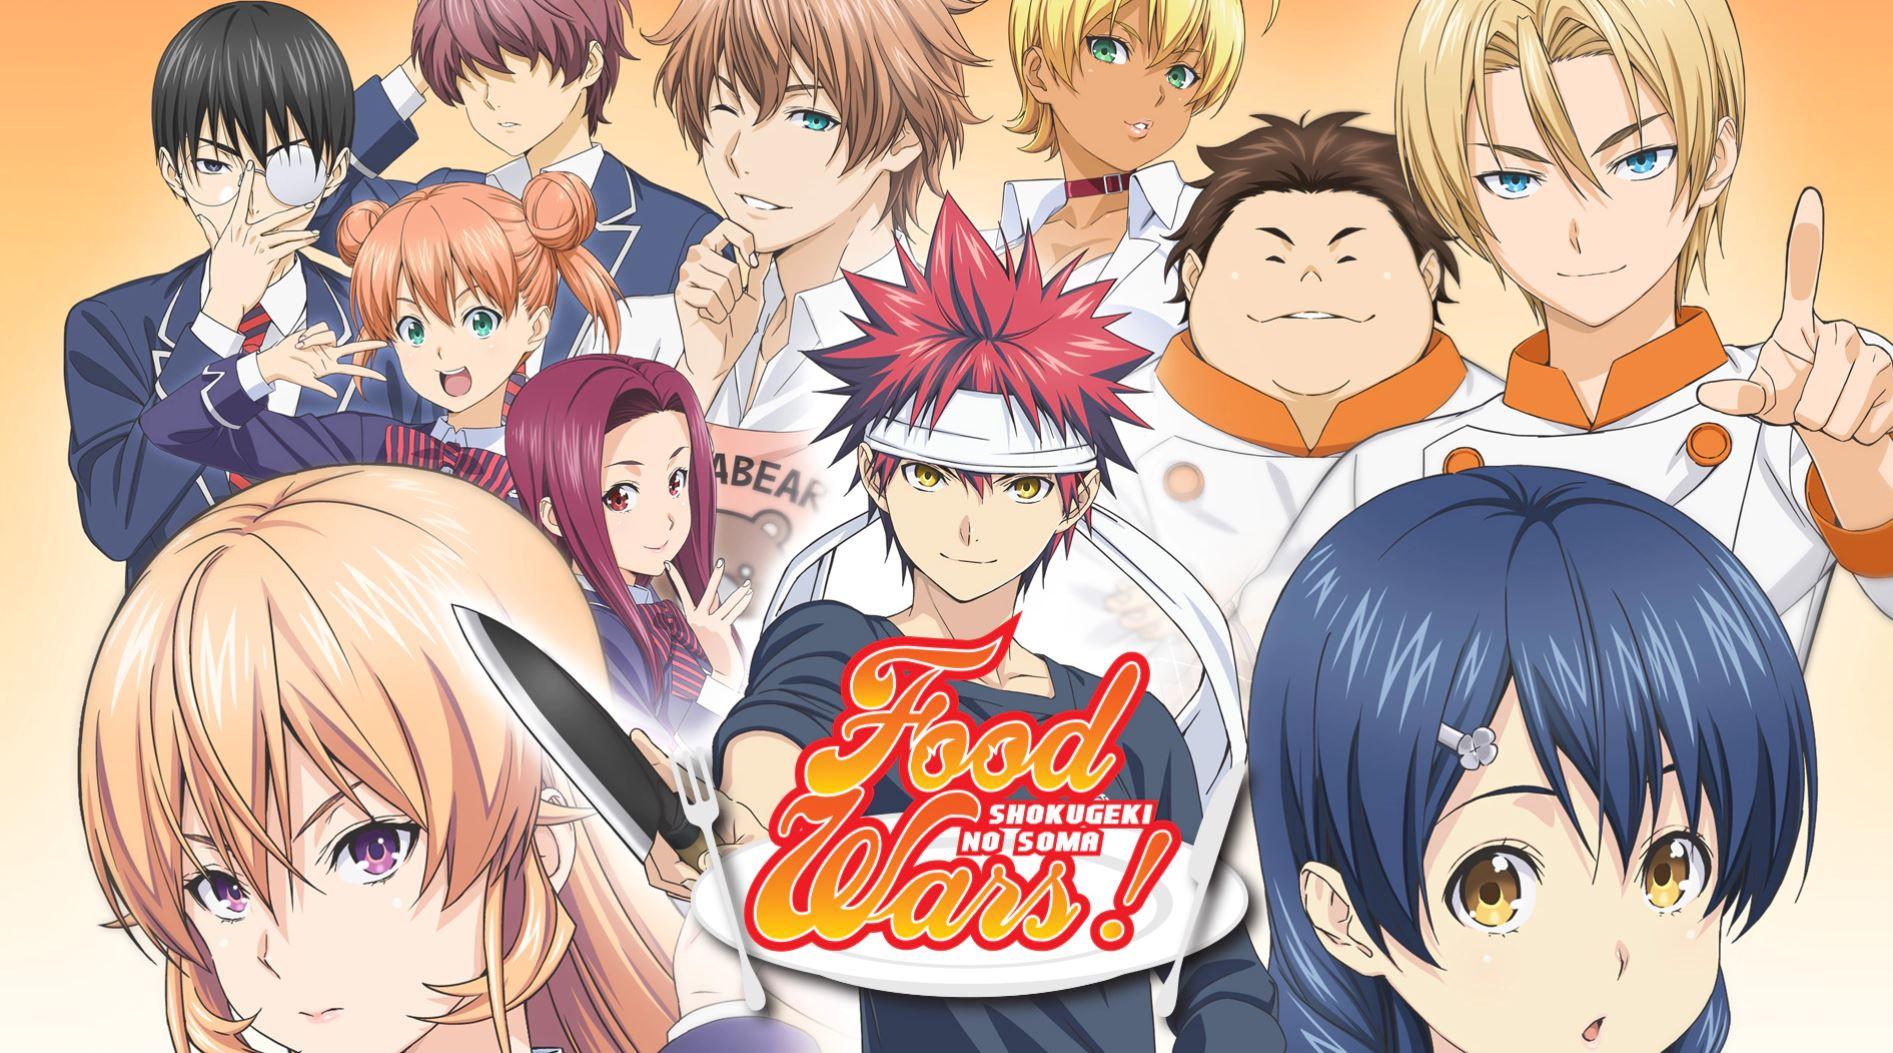 Food Wars Season 3